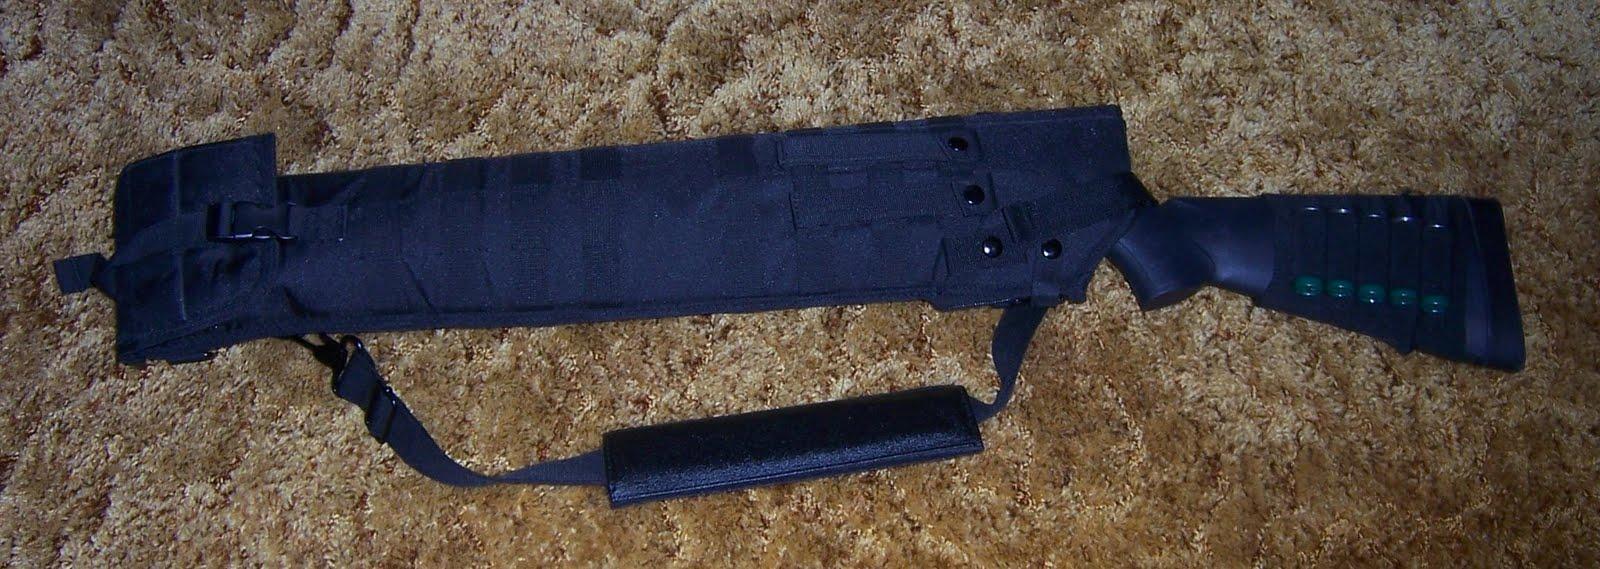 plastic spanish dagger with scabbard costume shop